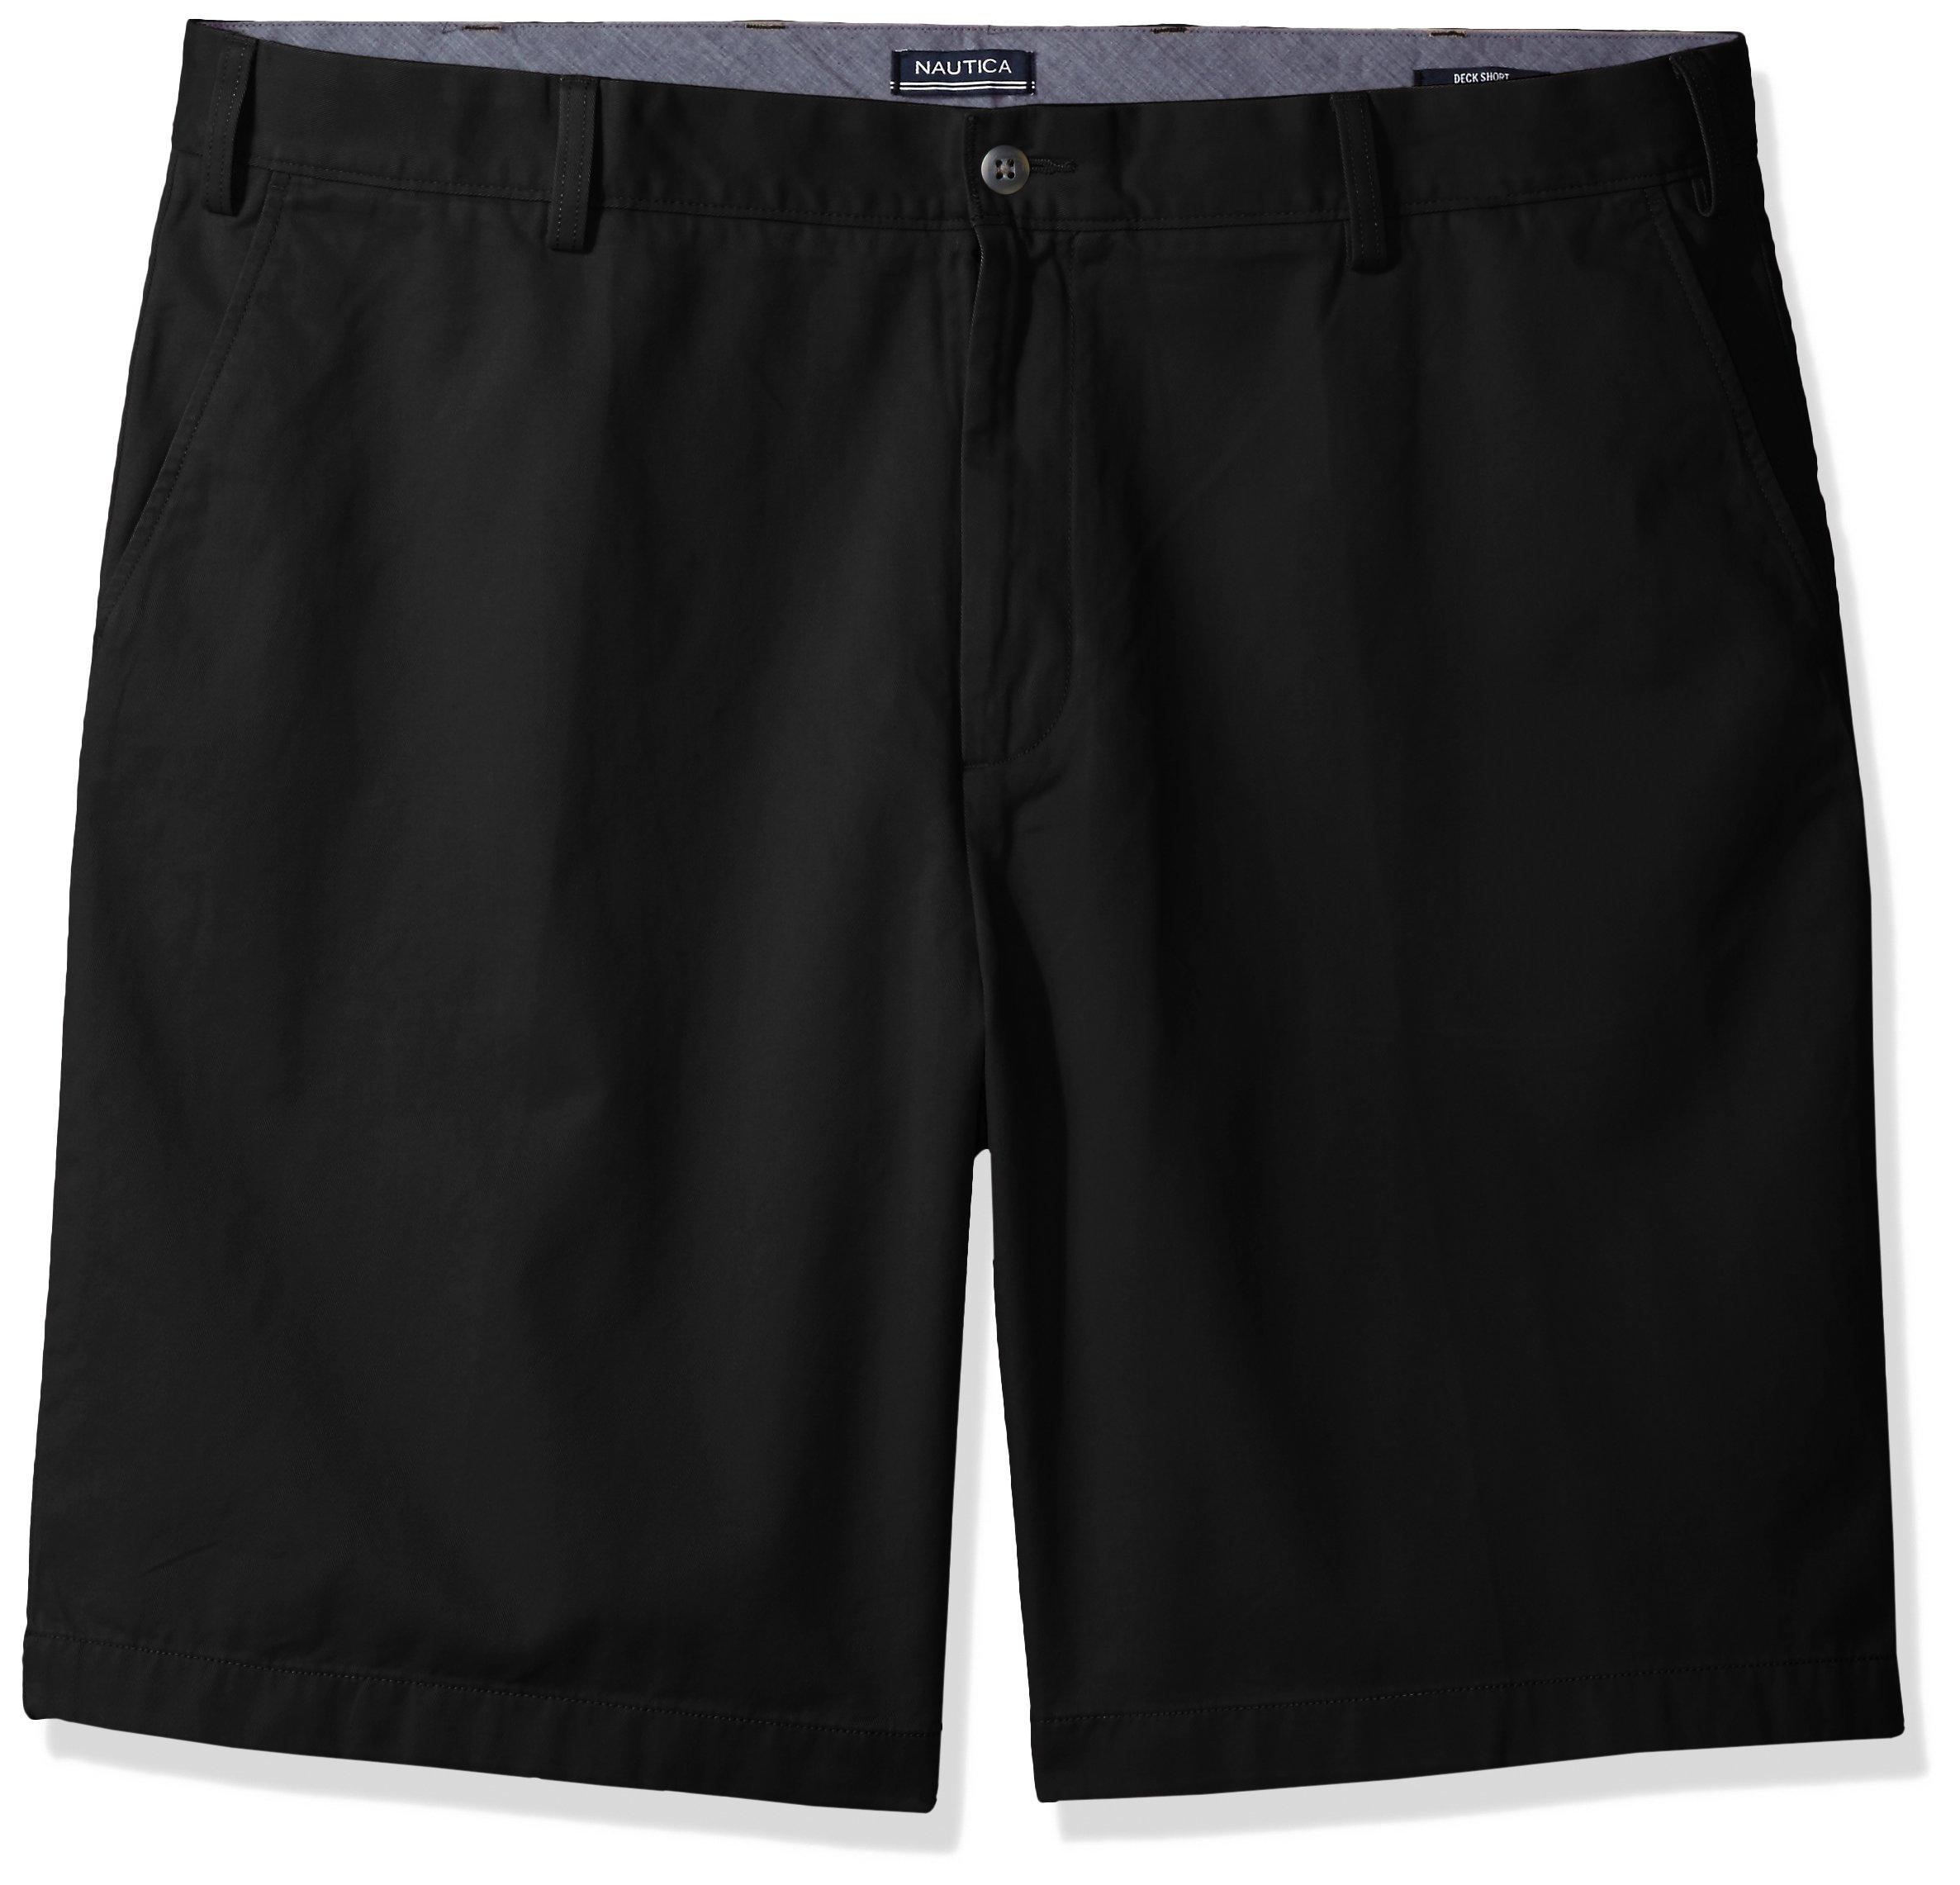 Nautica Men's Big and Tall Cotton Twill Flat Front Chino Deck Short-C92110, True Black, 46W